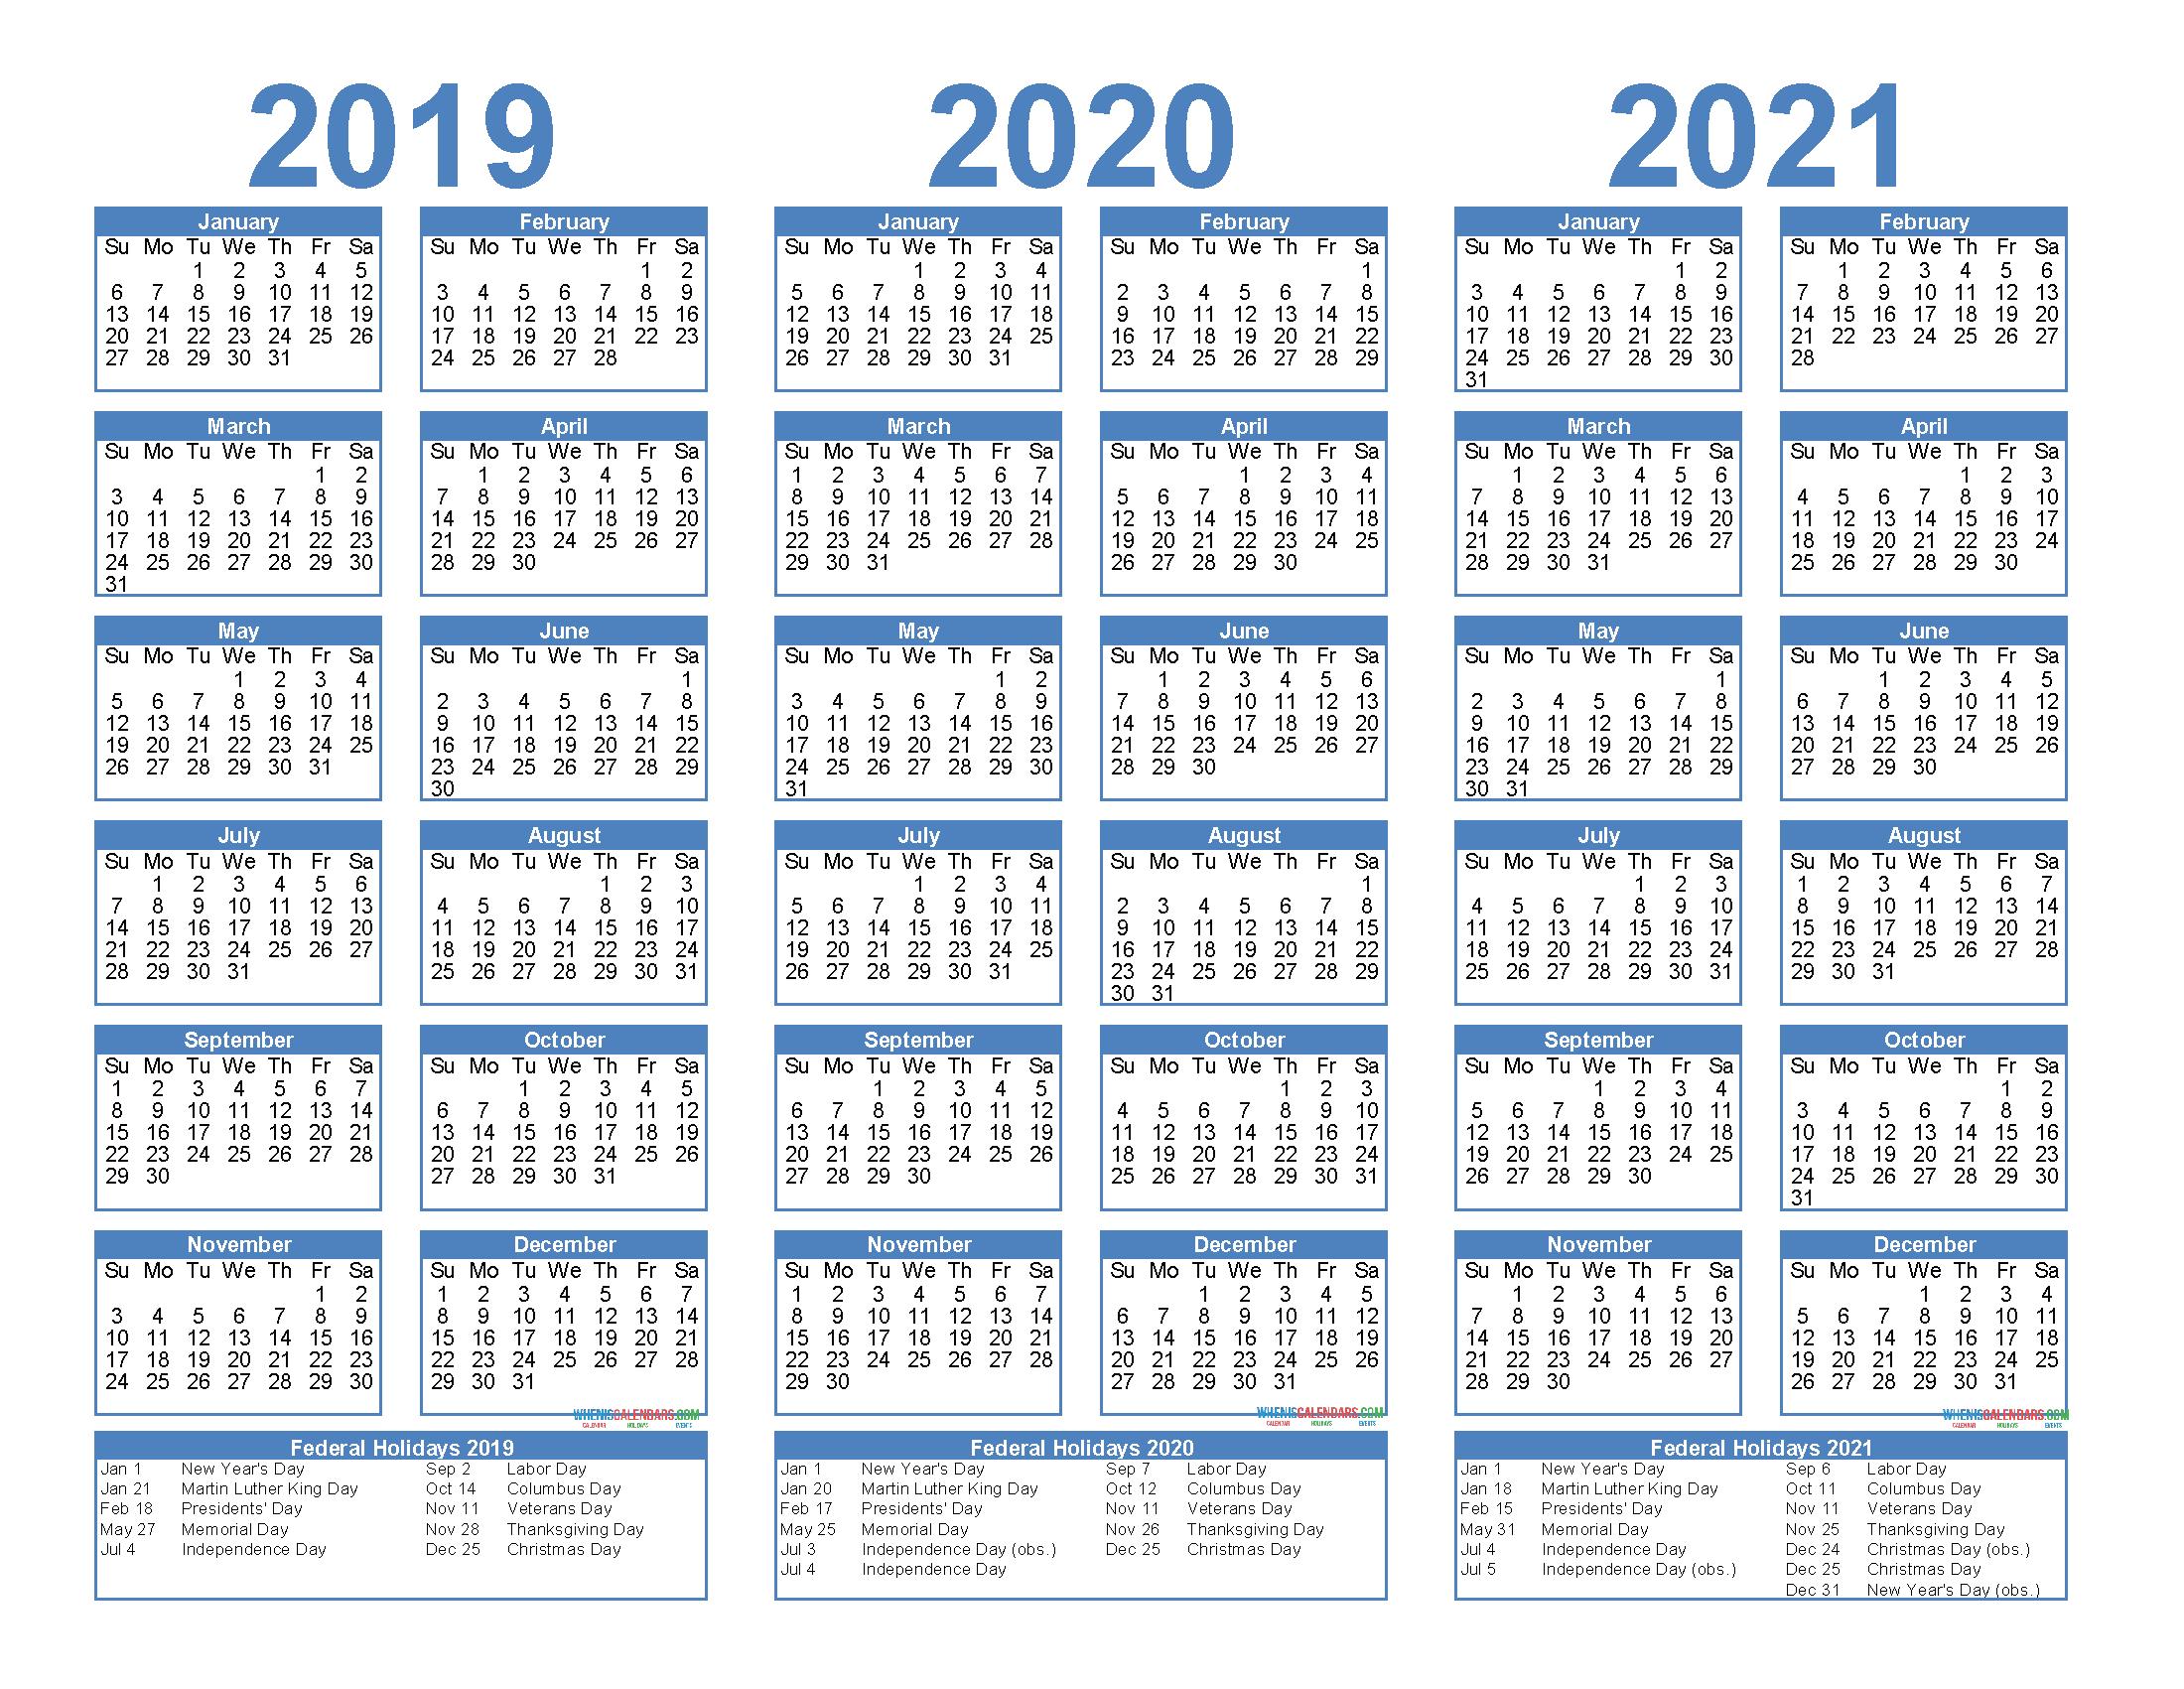 2021 Print Free Calendars Without Downloading | Calendar regarding Aramco Calendar 2021